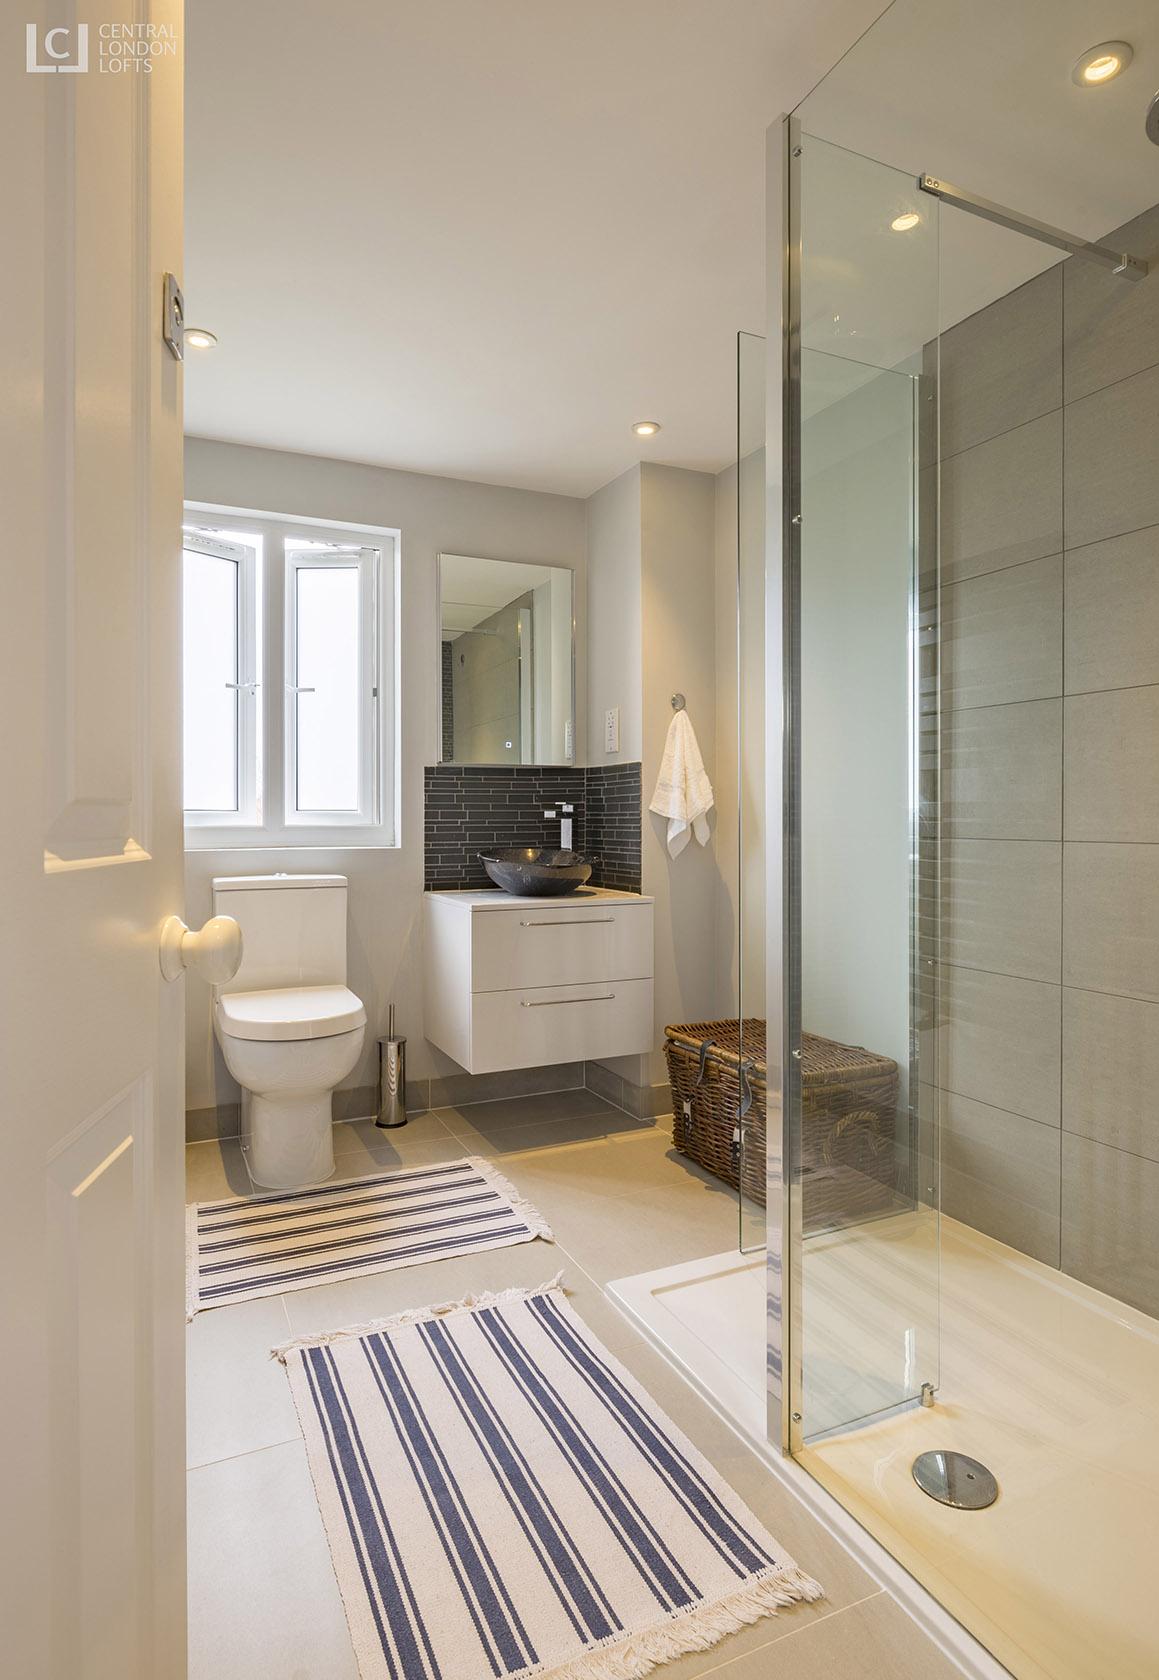 Eltham Loft Conversion Bathroom 1